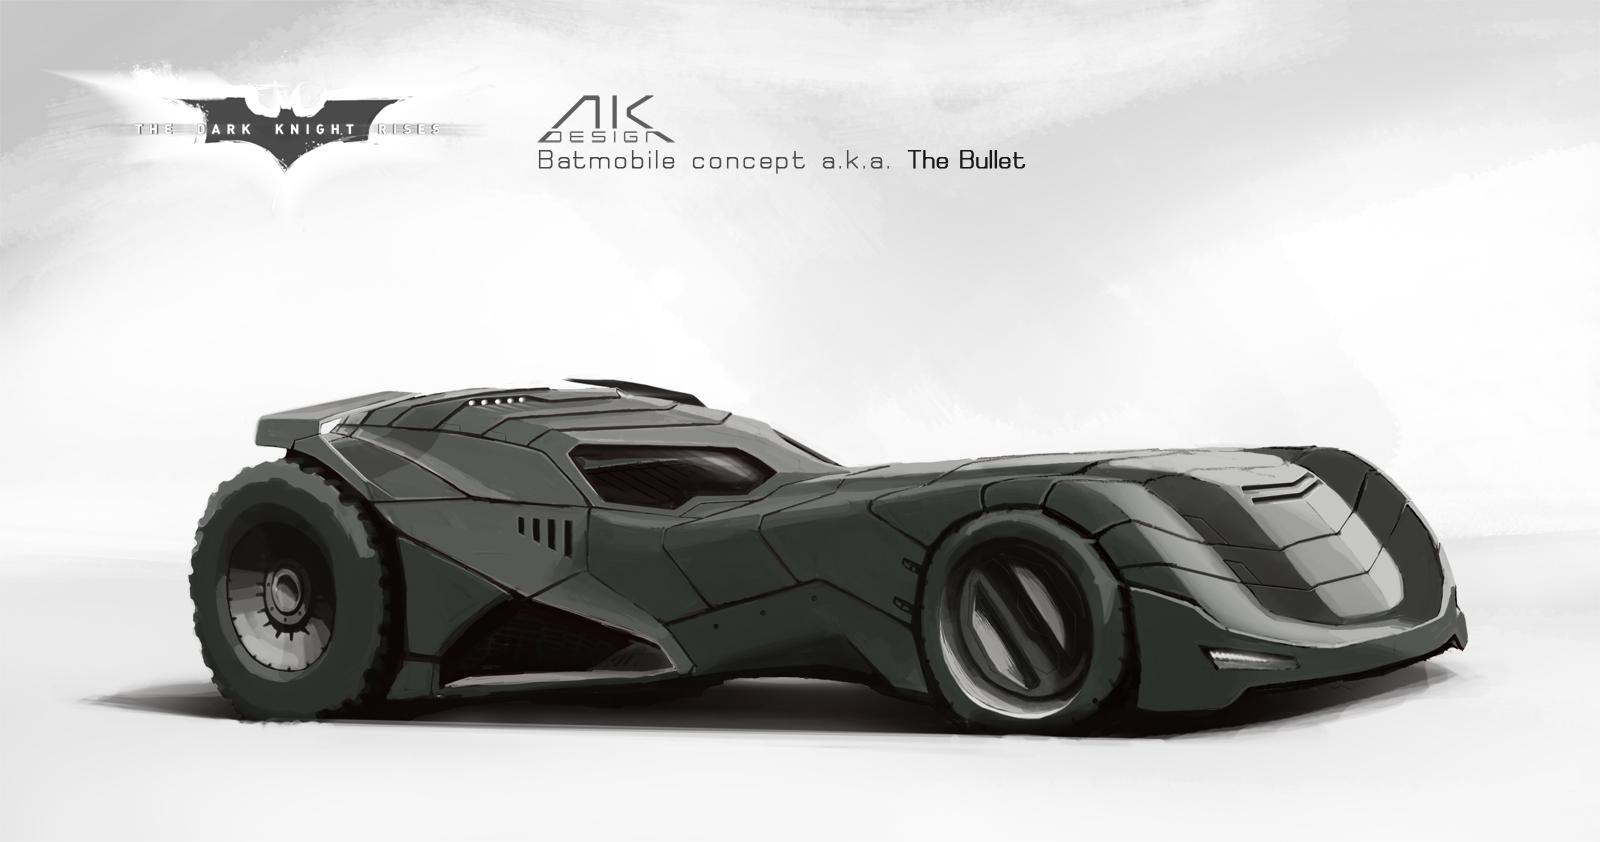 http://fc05.deviantart.net/fs71/f/2011/181/7/5/batmobile_concept_by_annaeus-d3kir4k.jpg